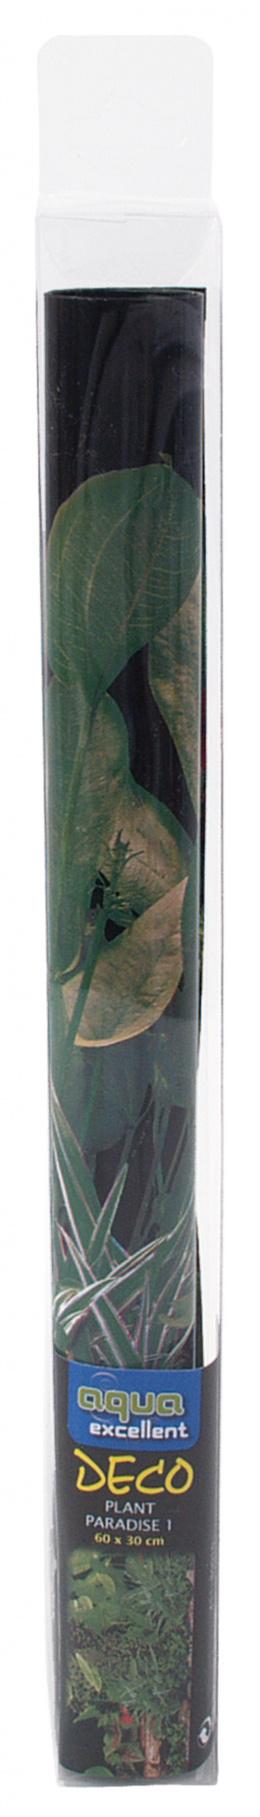 Fons akvārijam - Augi 100*50cm